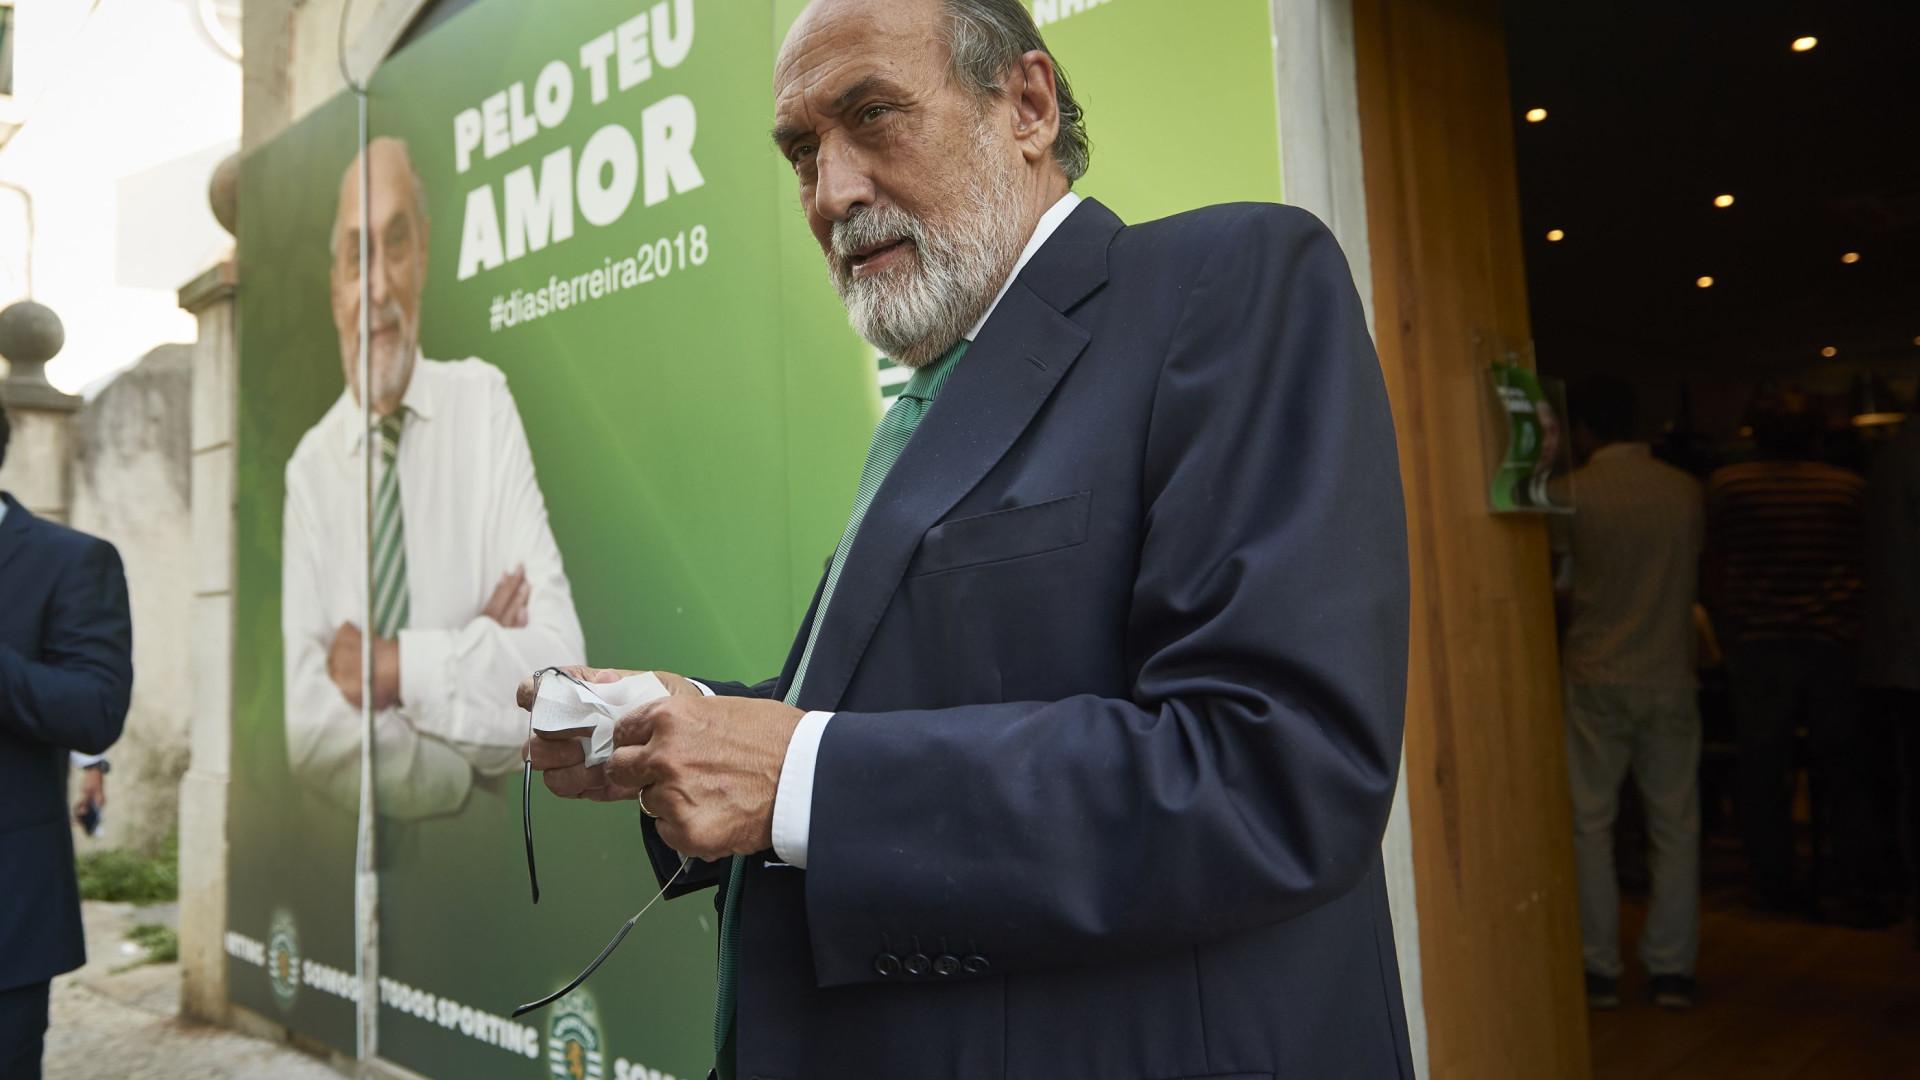 Dias Ferreira deixa duras críticas a Sousa Cintra